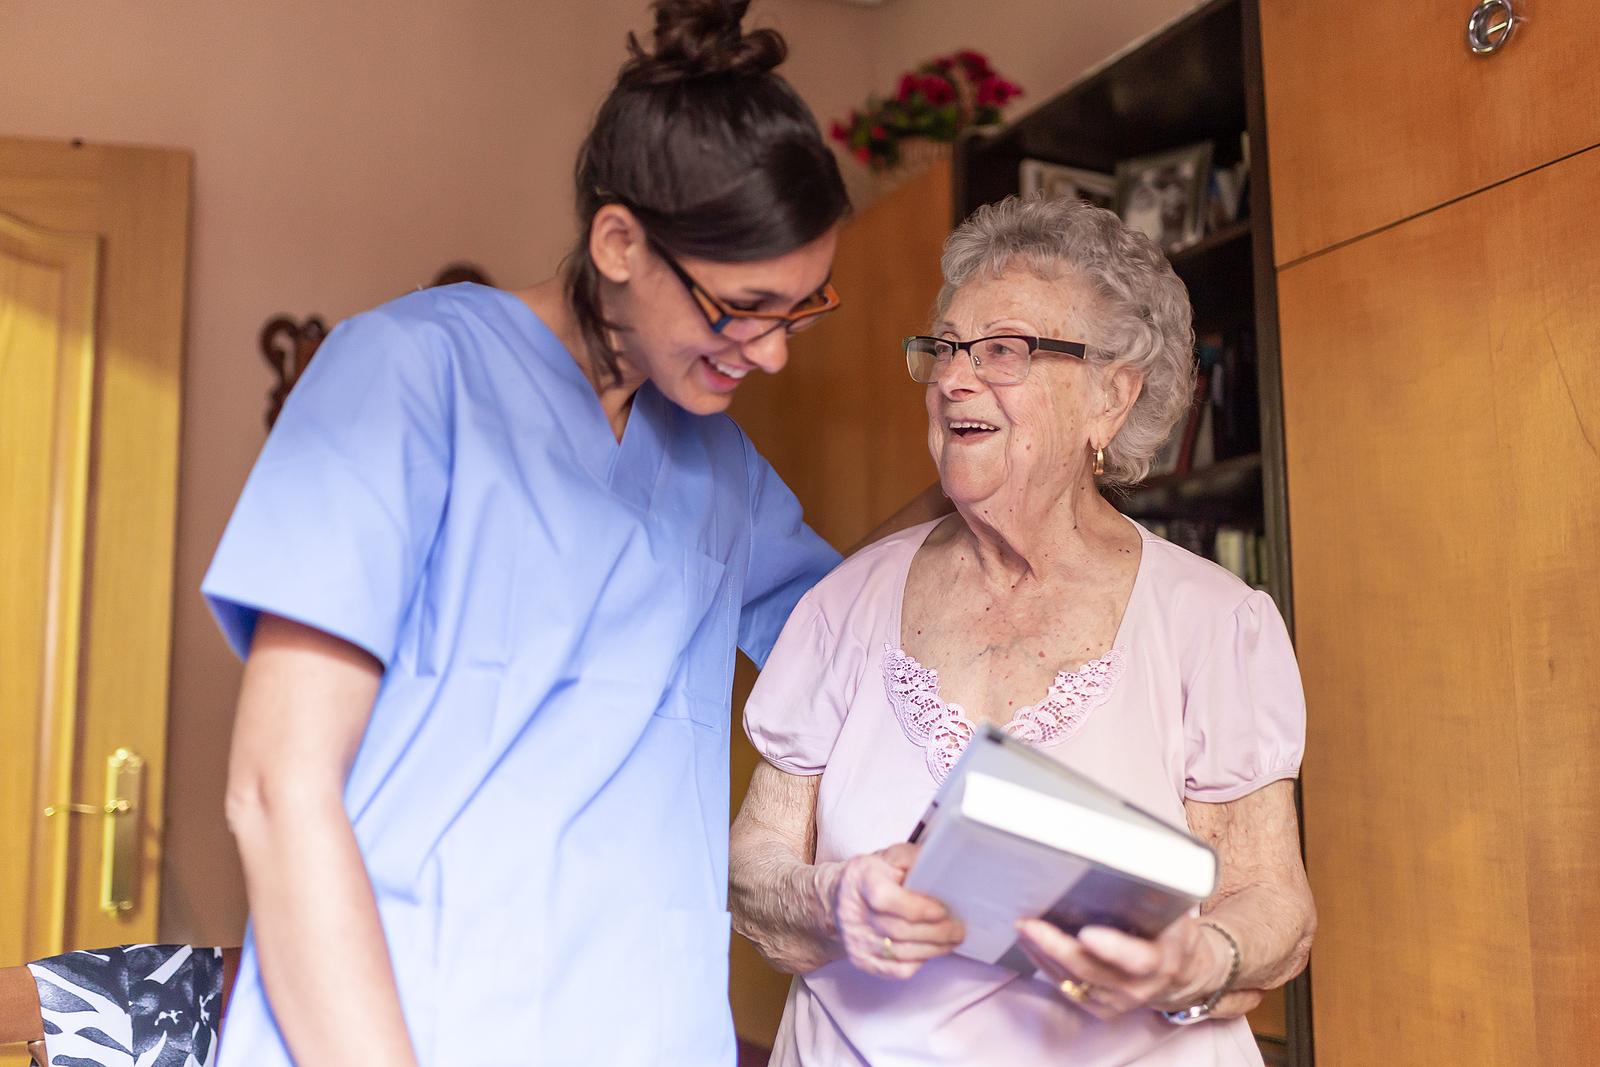 Home Care Services in Yuba City CA: Senior Assistance